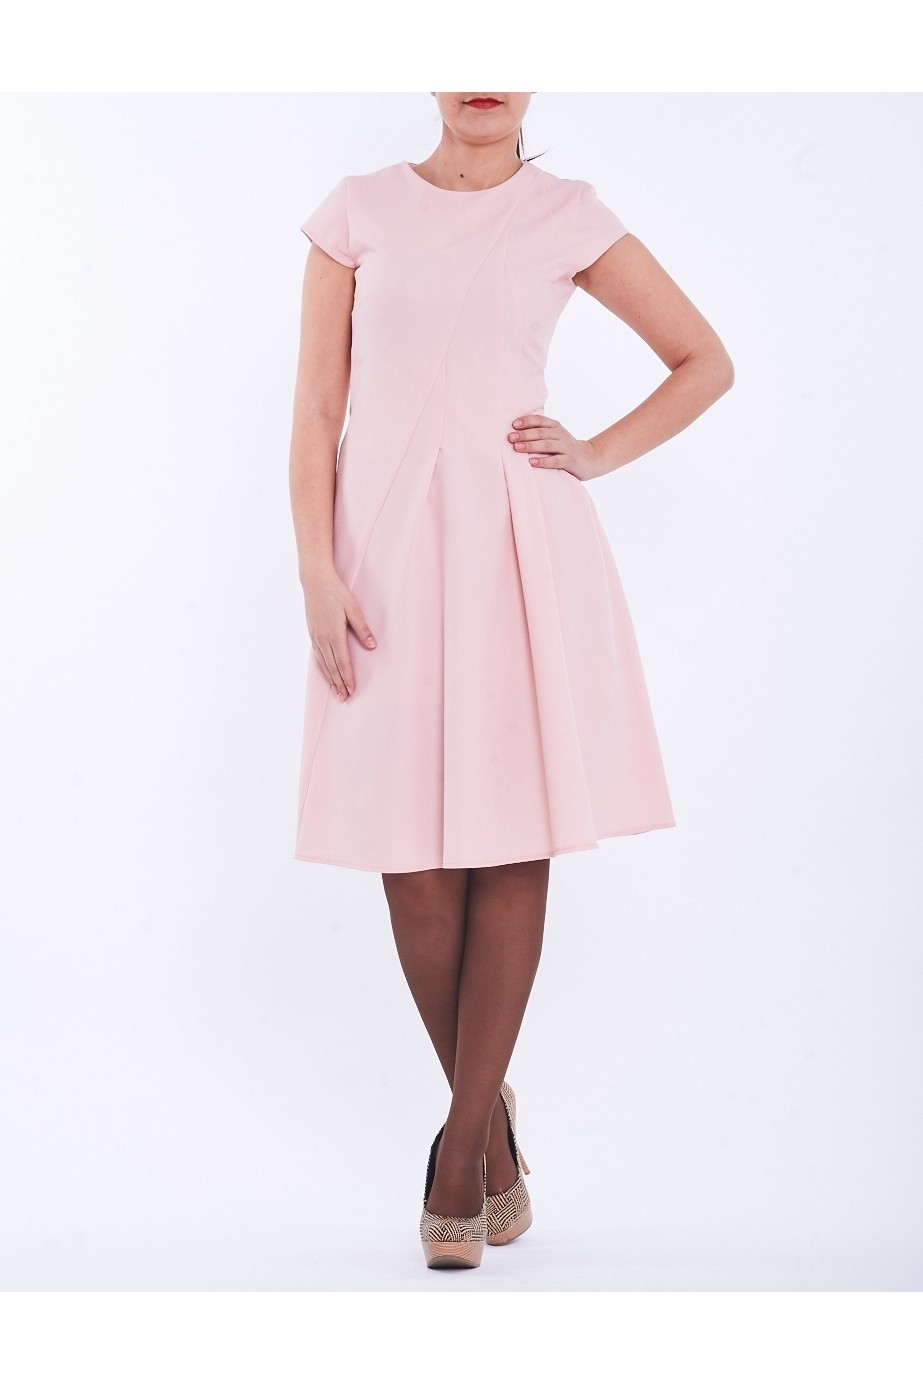 Rochie roz pal cu pliuri pe partea stanga TinaR 34